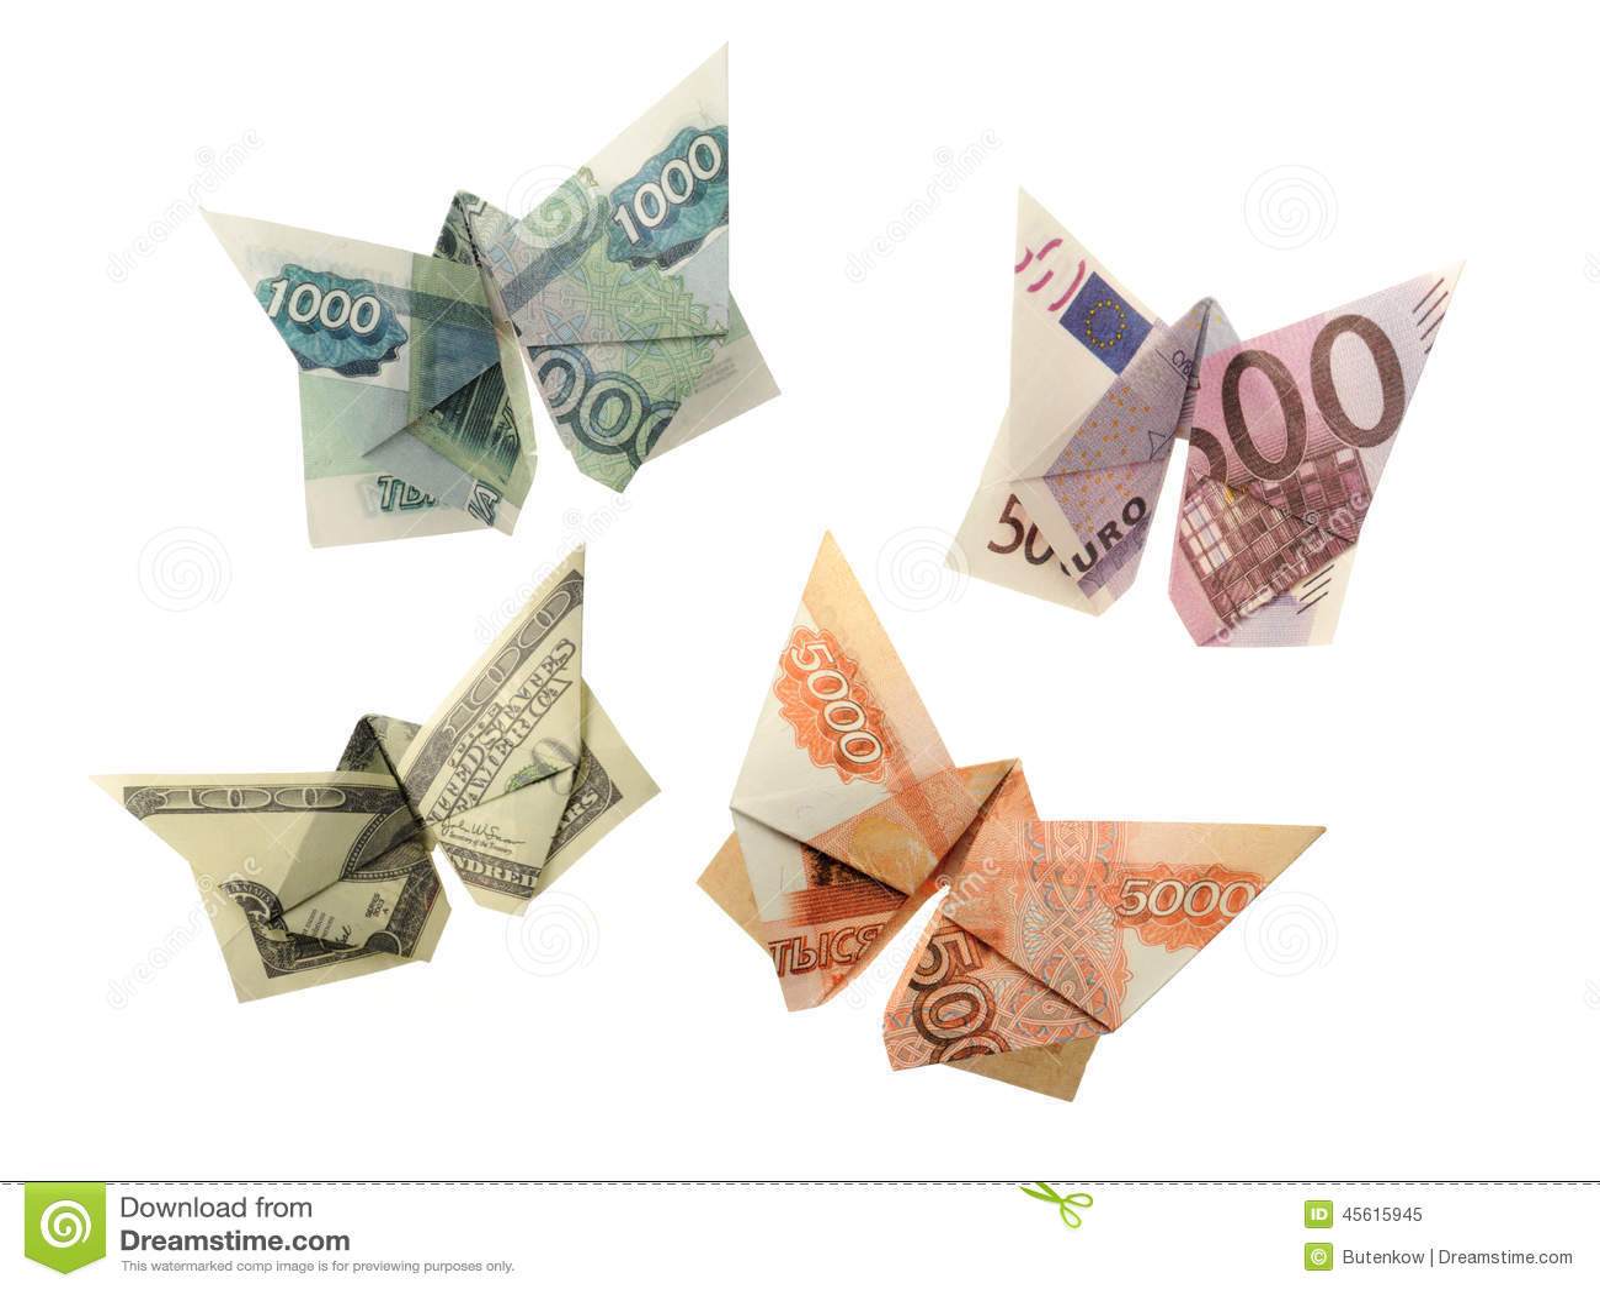 Origami Butterflies Euro, Dollar, Ruble Stock Photo ... - photo#40